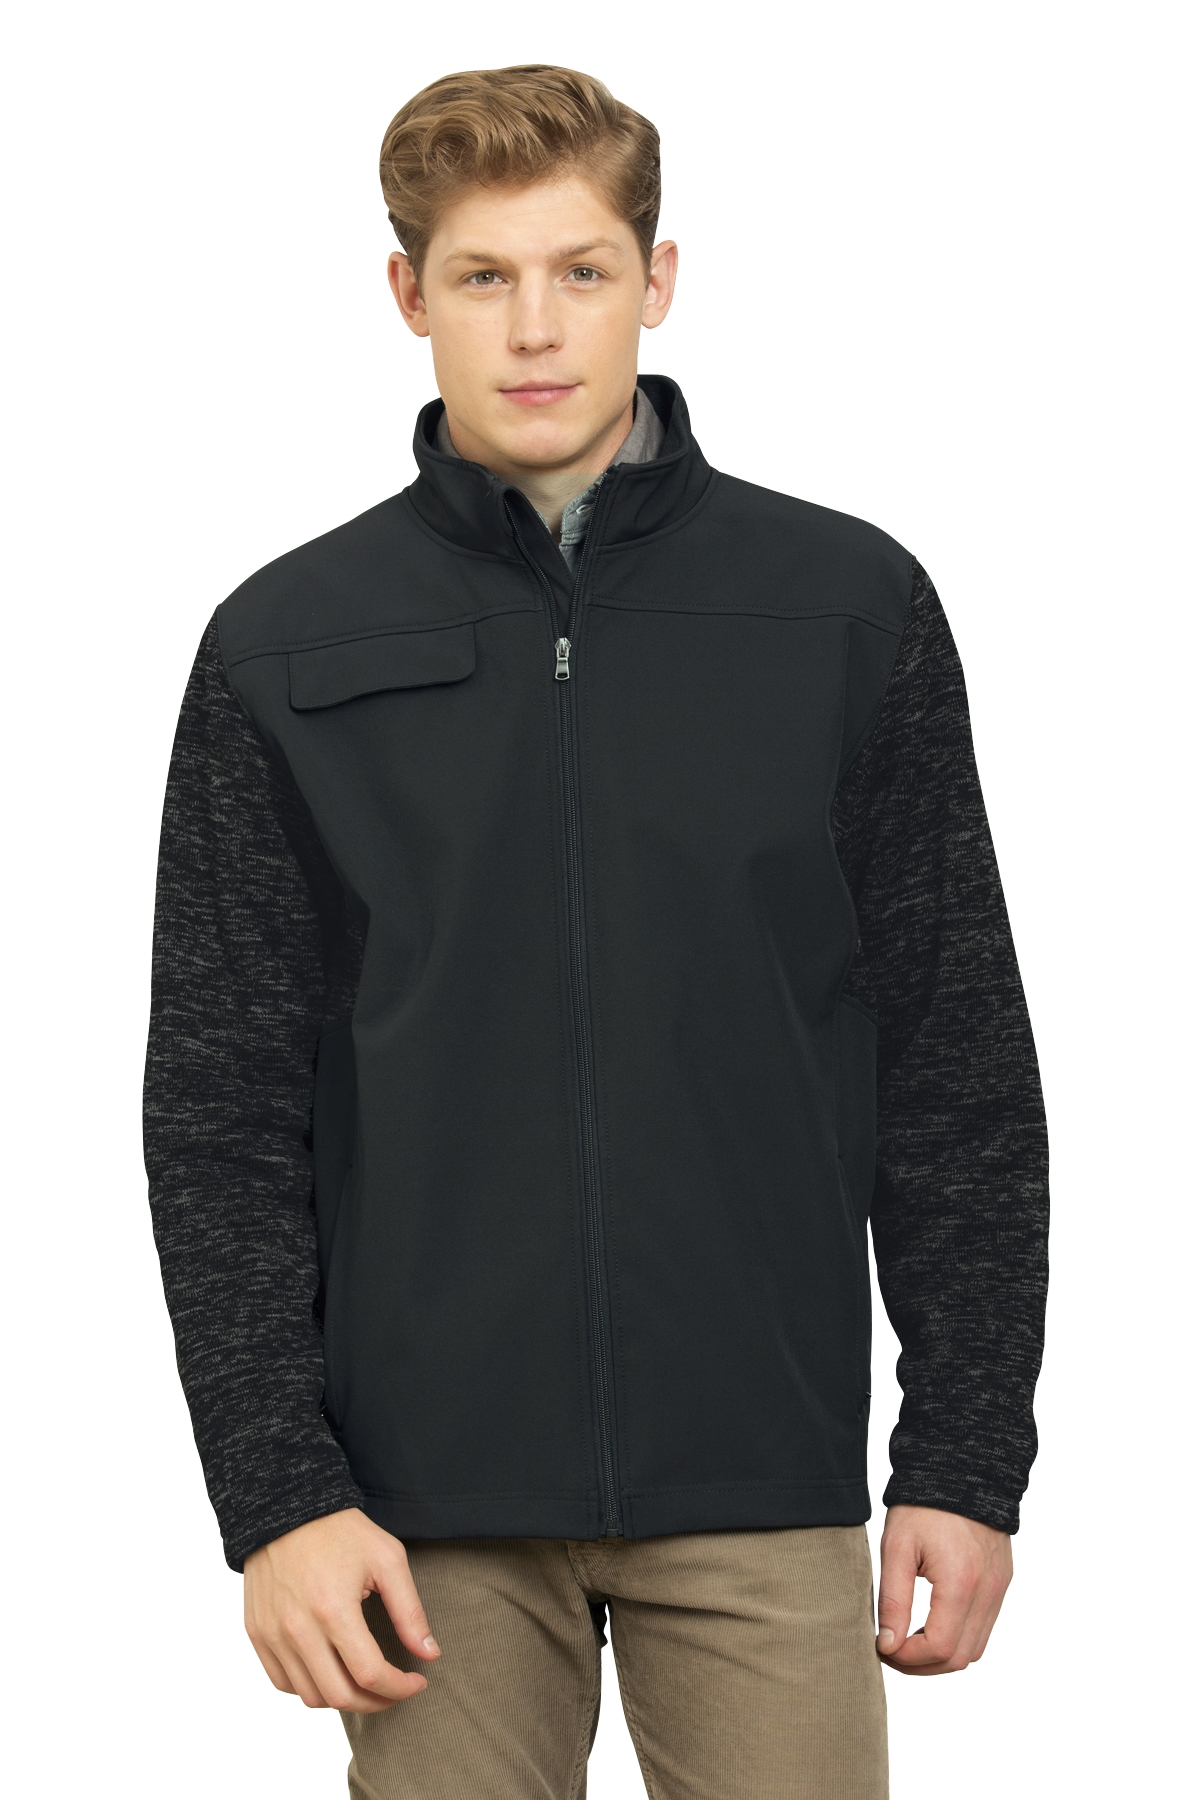 Vantage 7317 - Men's SoHo Jacket